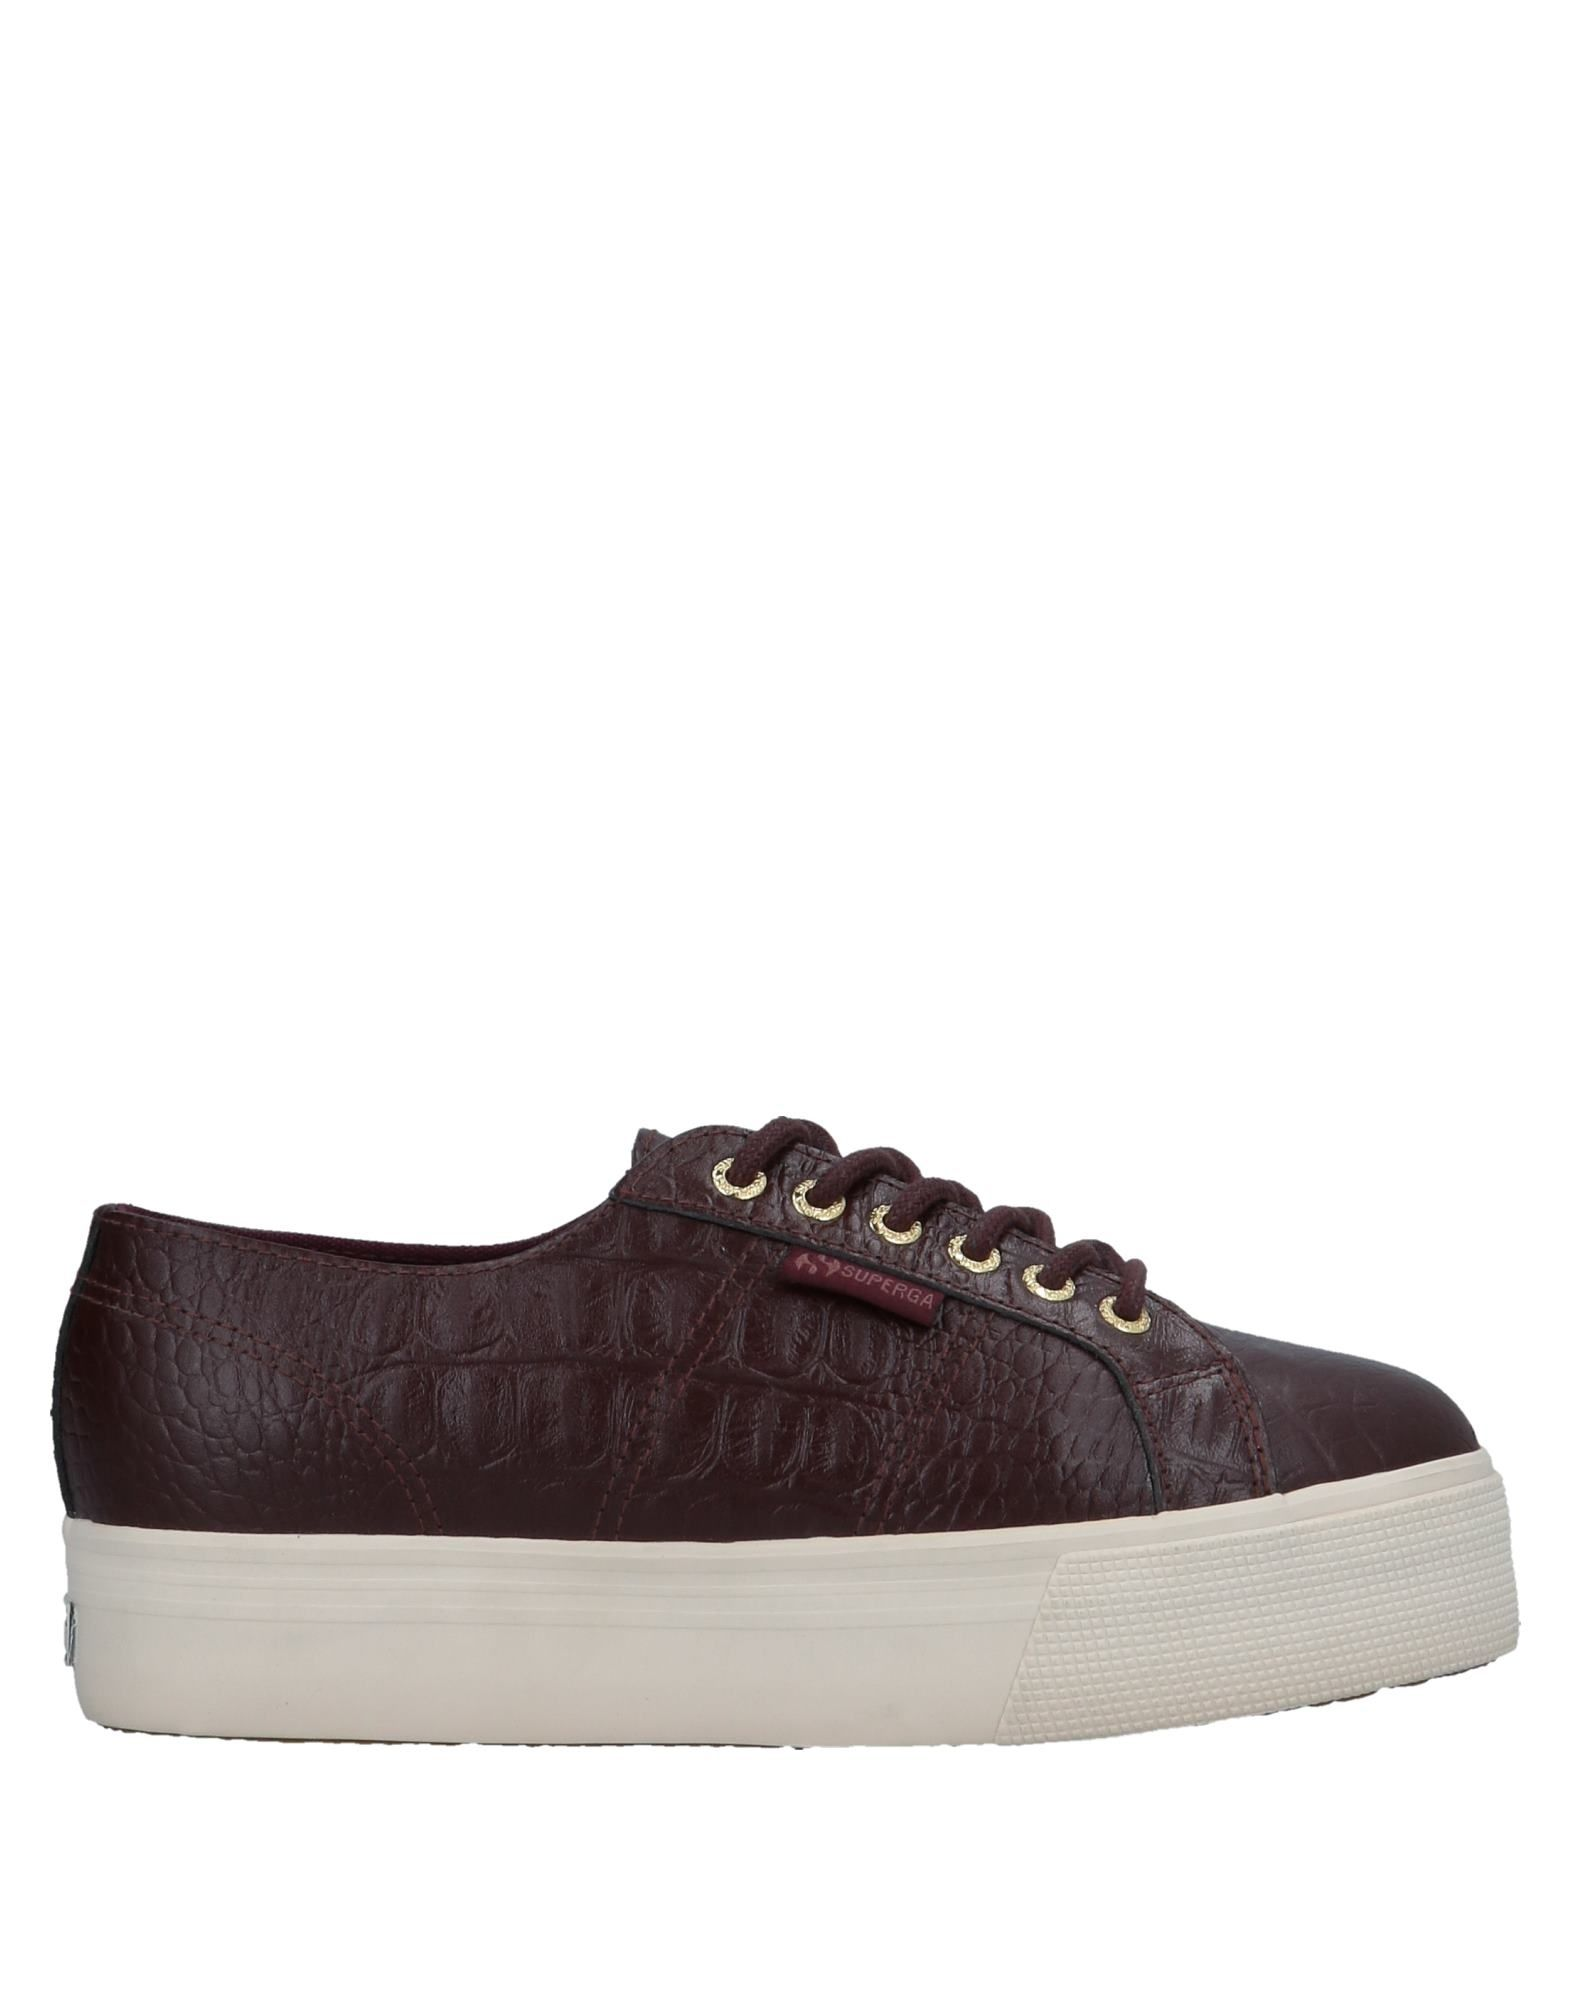 Superga® Sneakers - Women Superga® Sneakers - online on  Australia - Sneakers 11571228VI f569ac